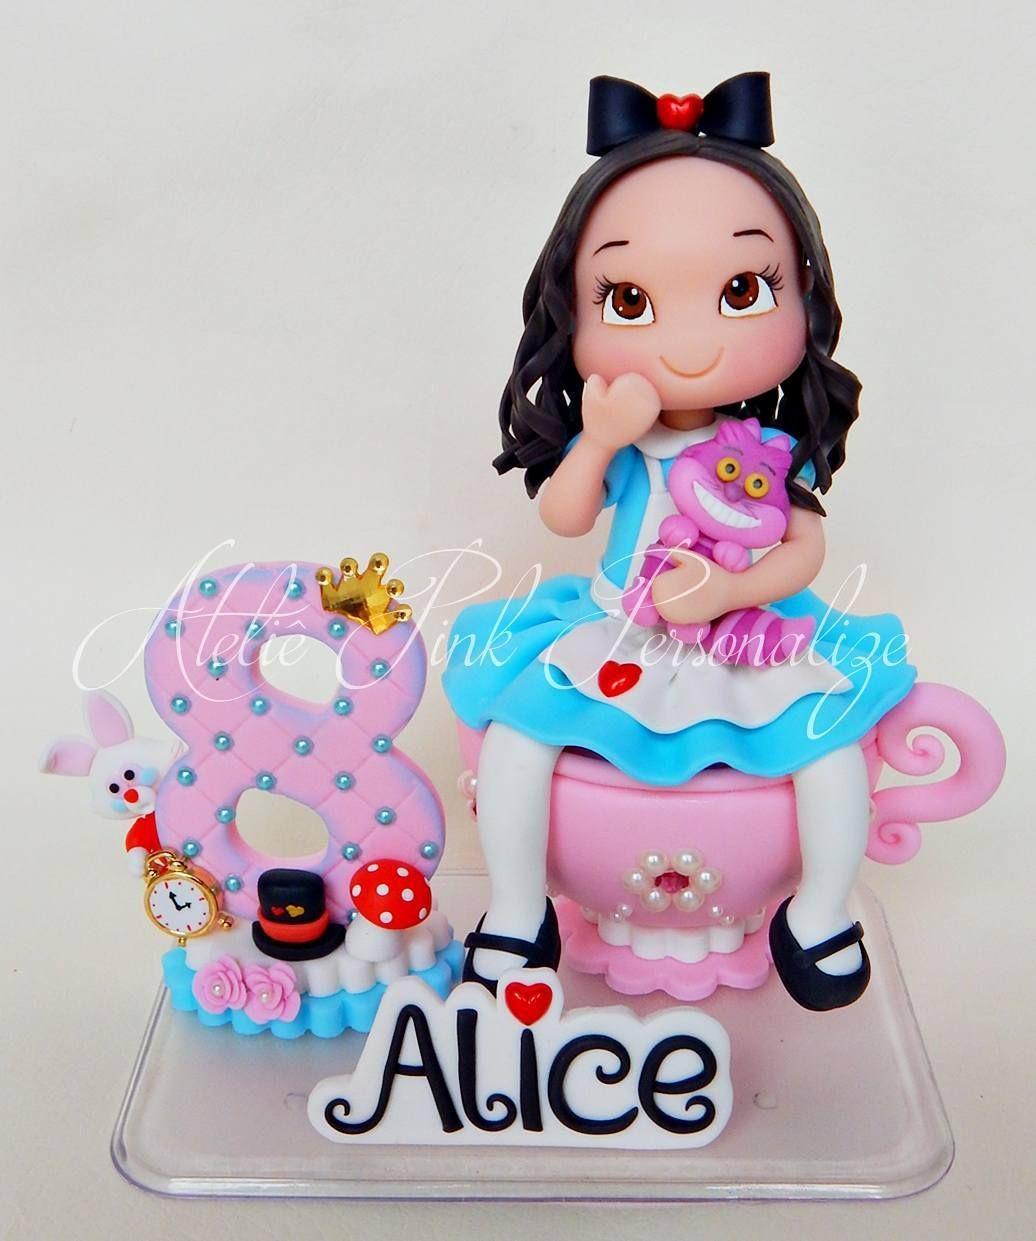 Apliques Alice No Pais Das Maravilhas No Elo7 Chez Biscuit